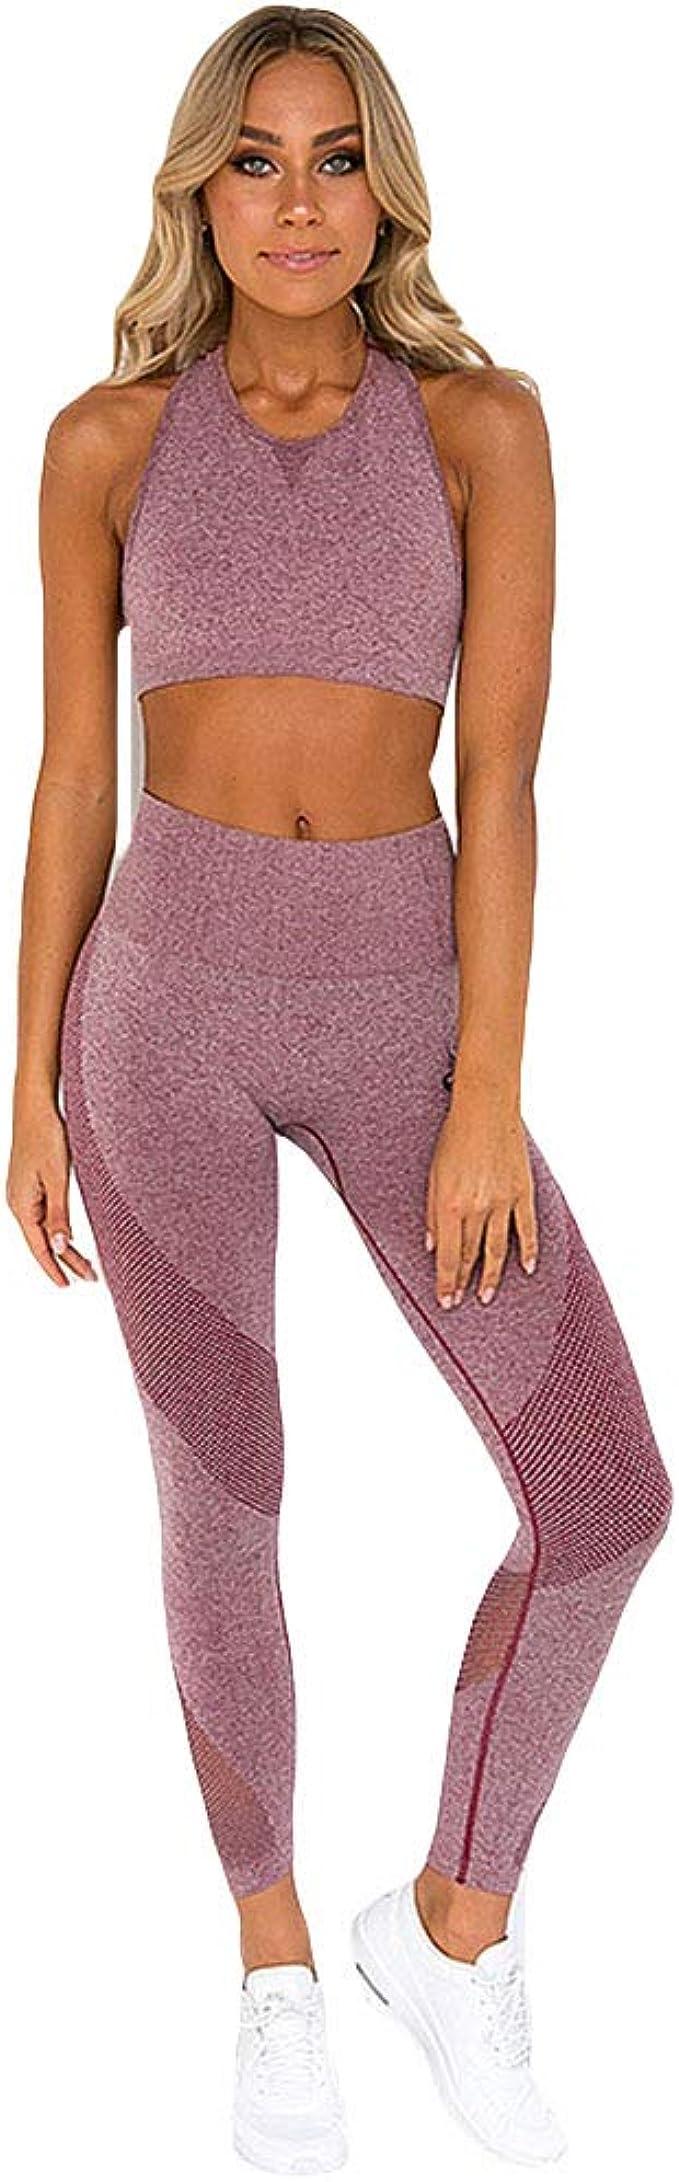 Amazon.com: Hotexy - Juego de 2 leggings de yoga de cintura ...